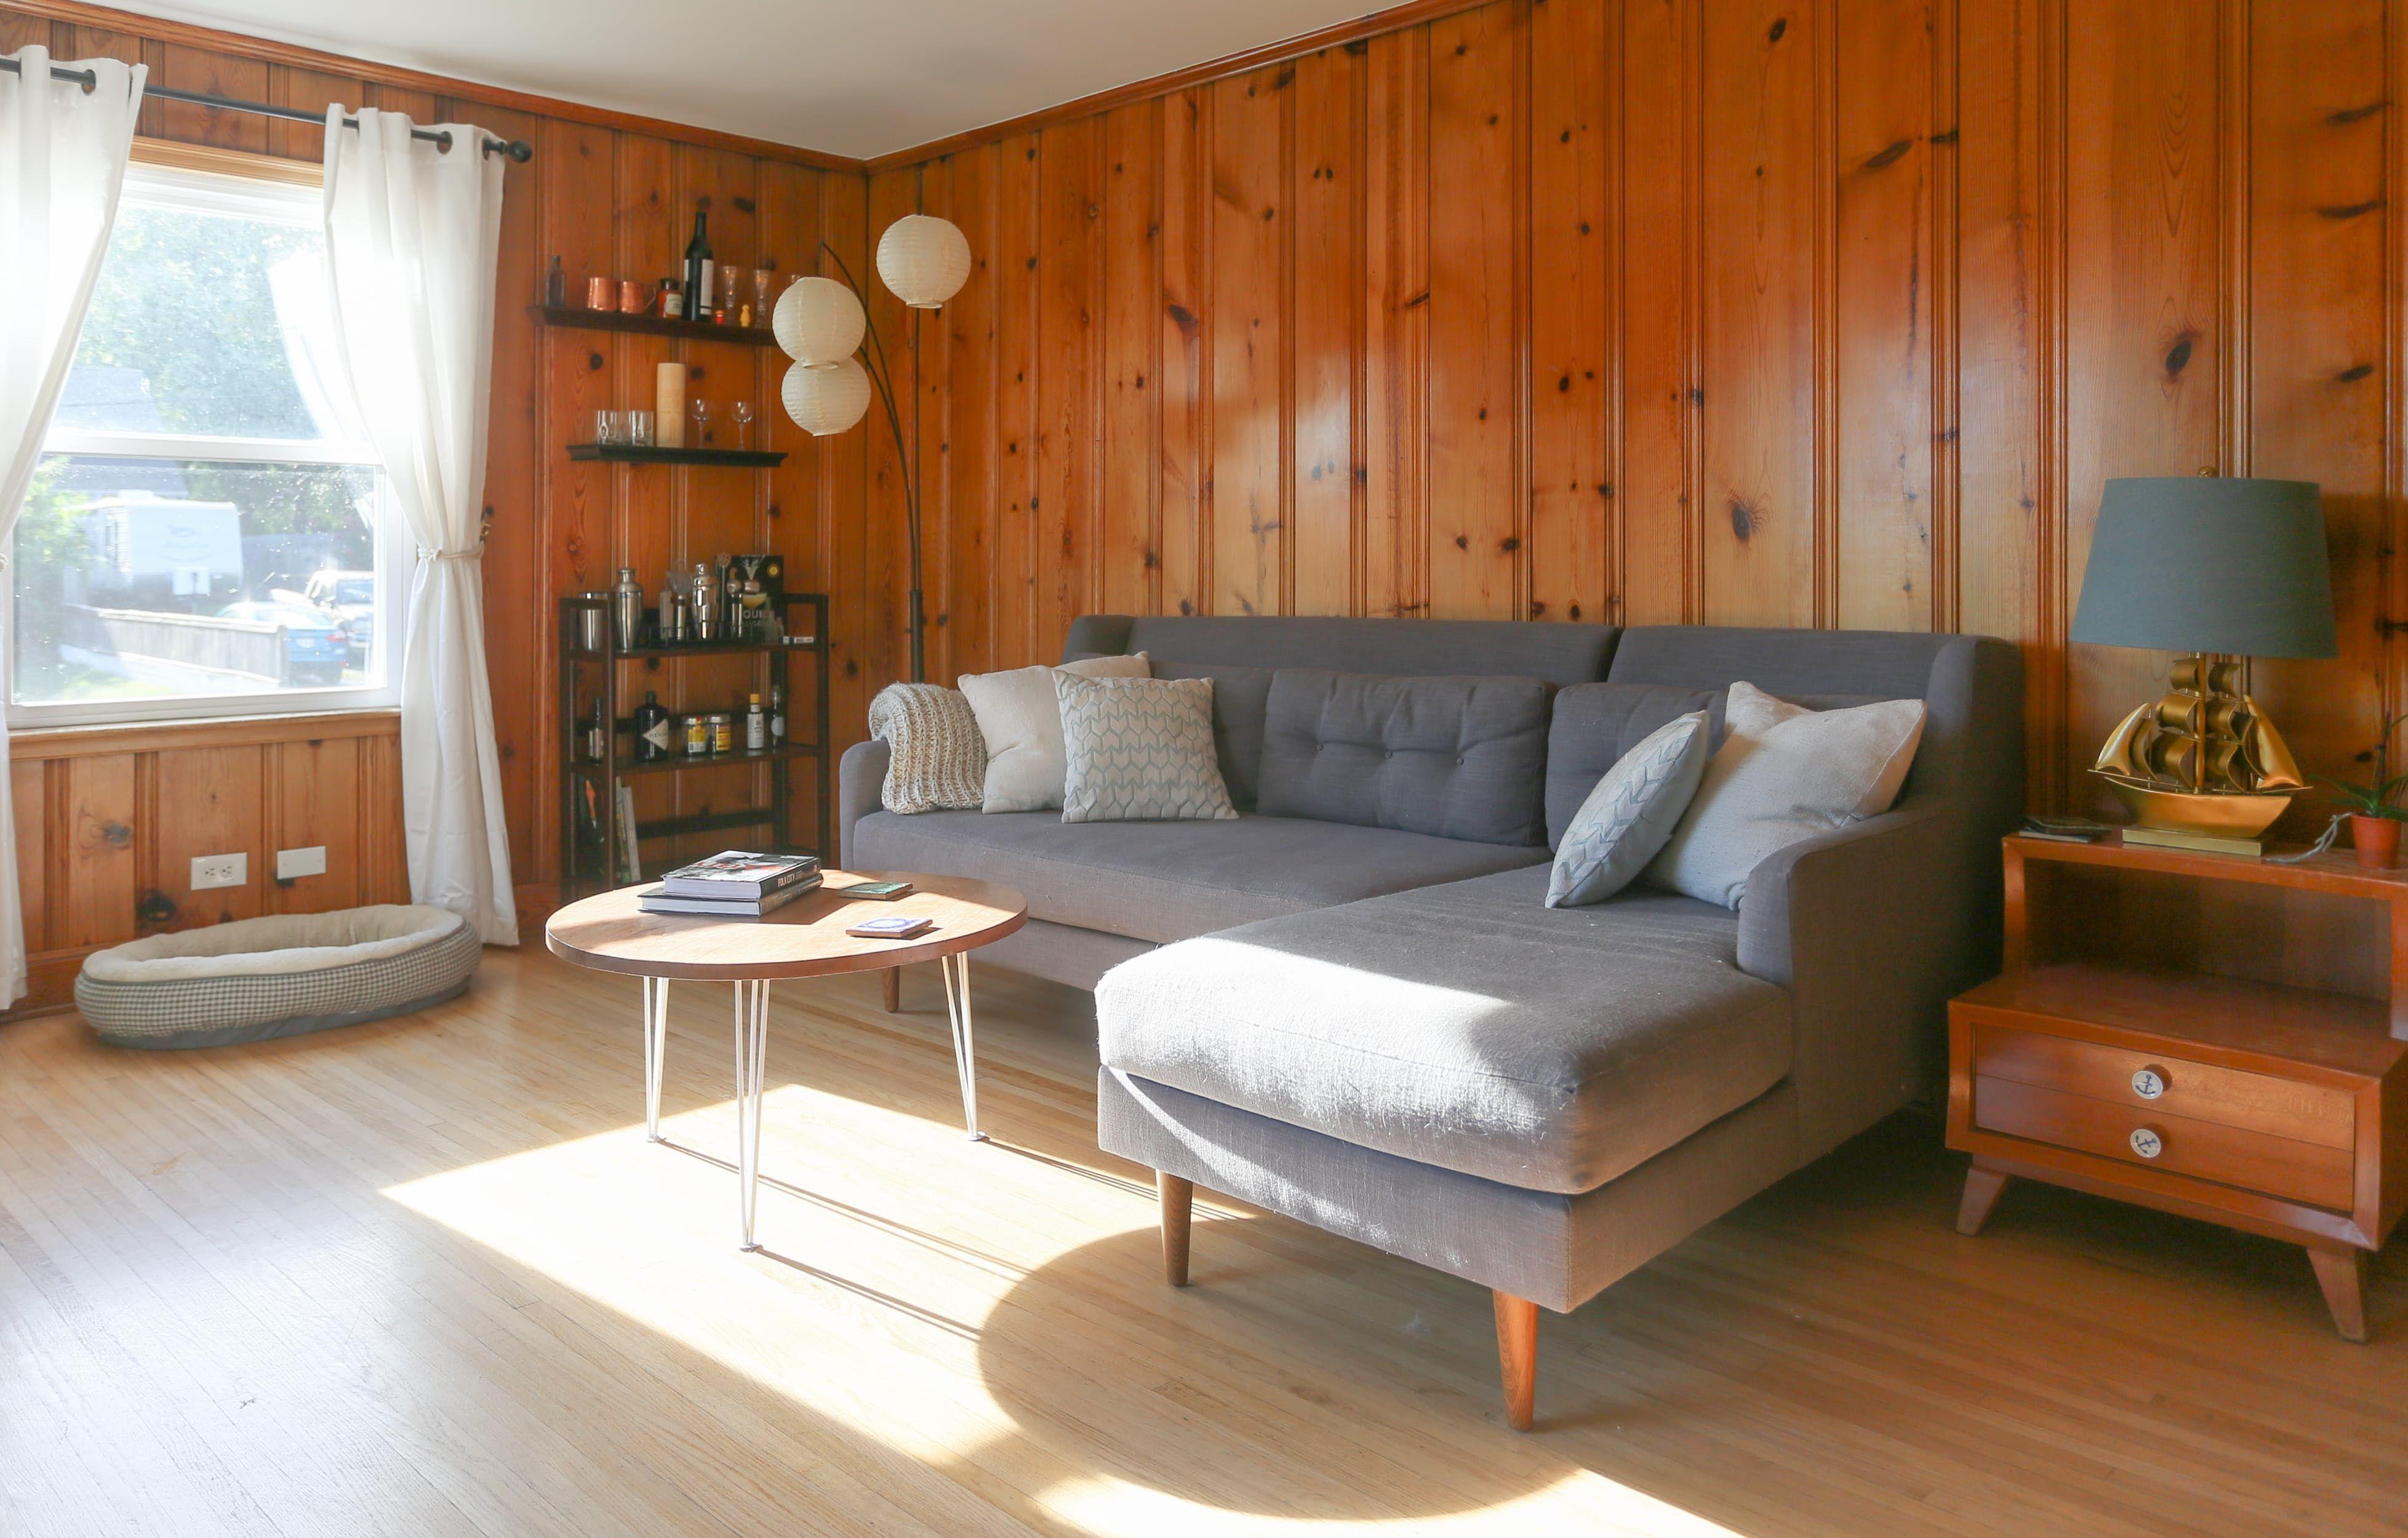 A Nashville Singer Songwriter S Home Living Room Panelling Wood Paneling Living Room Wood Walls Living Room